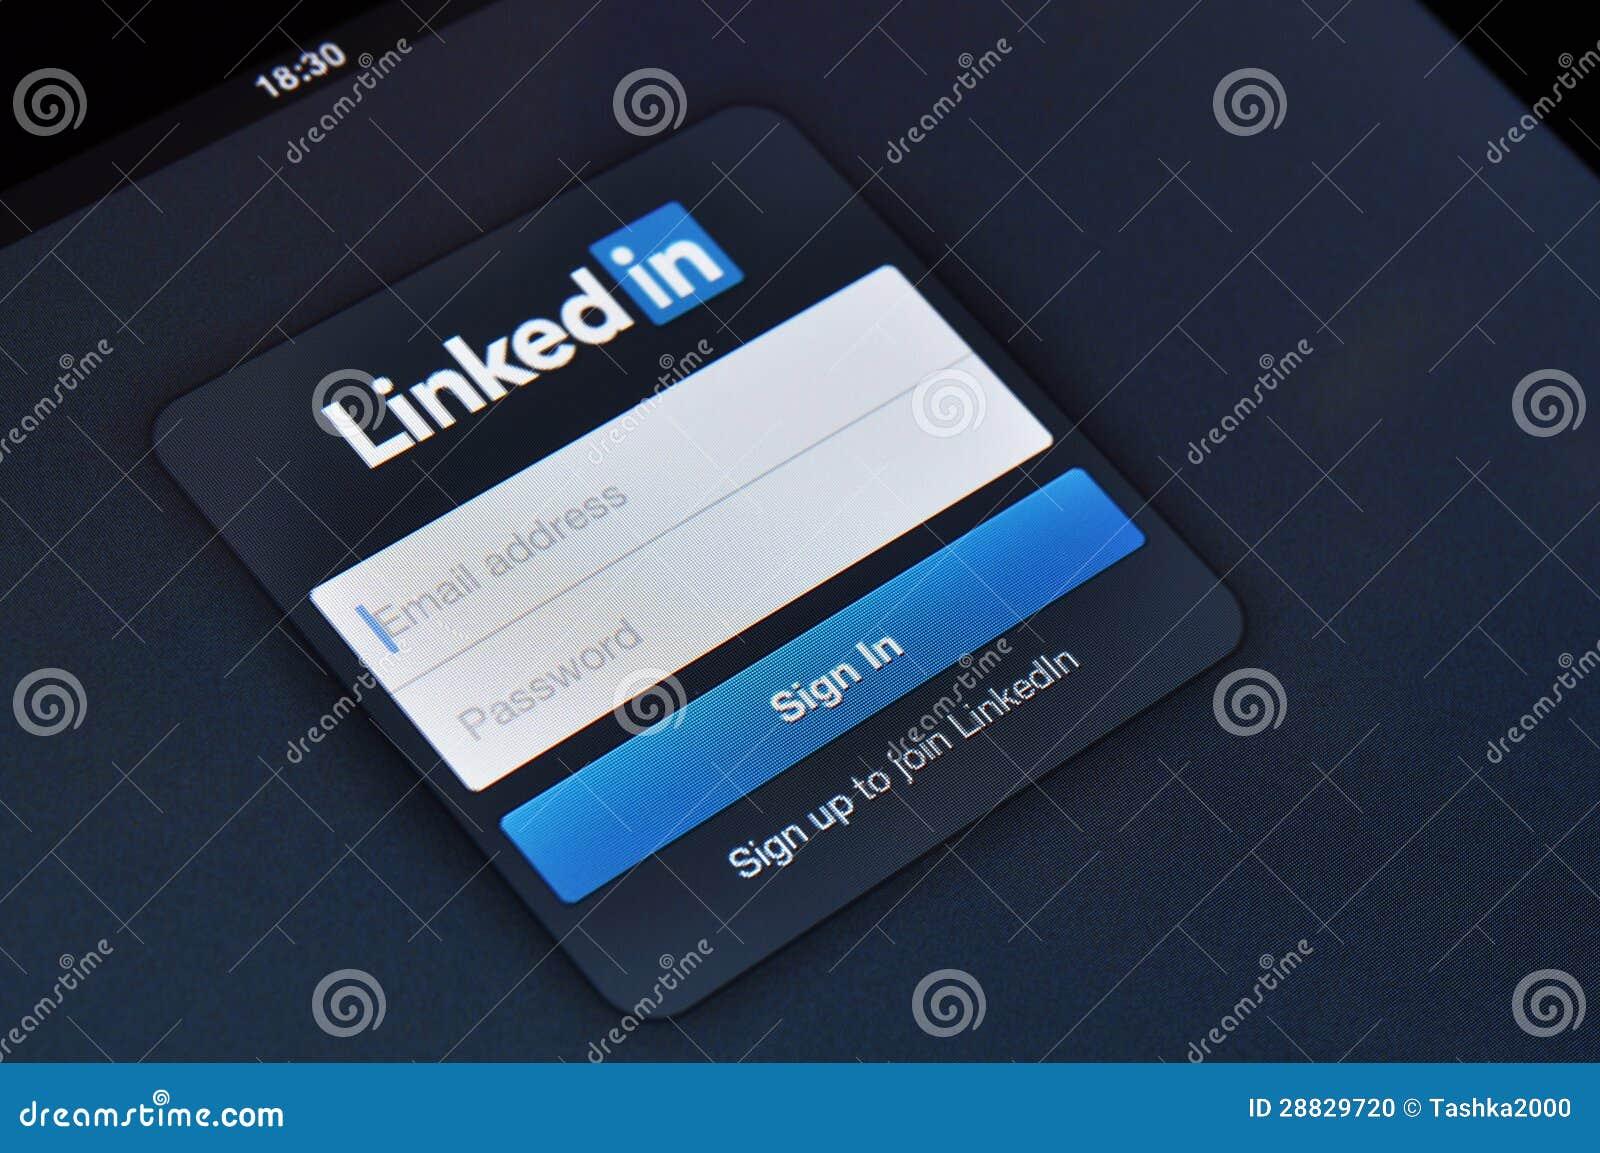 Linkedin Login Page On Apple IPad Screen Editorial Image